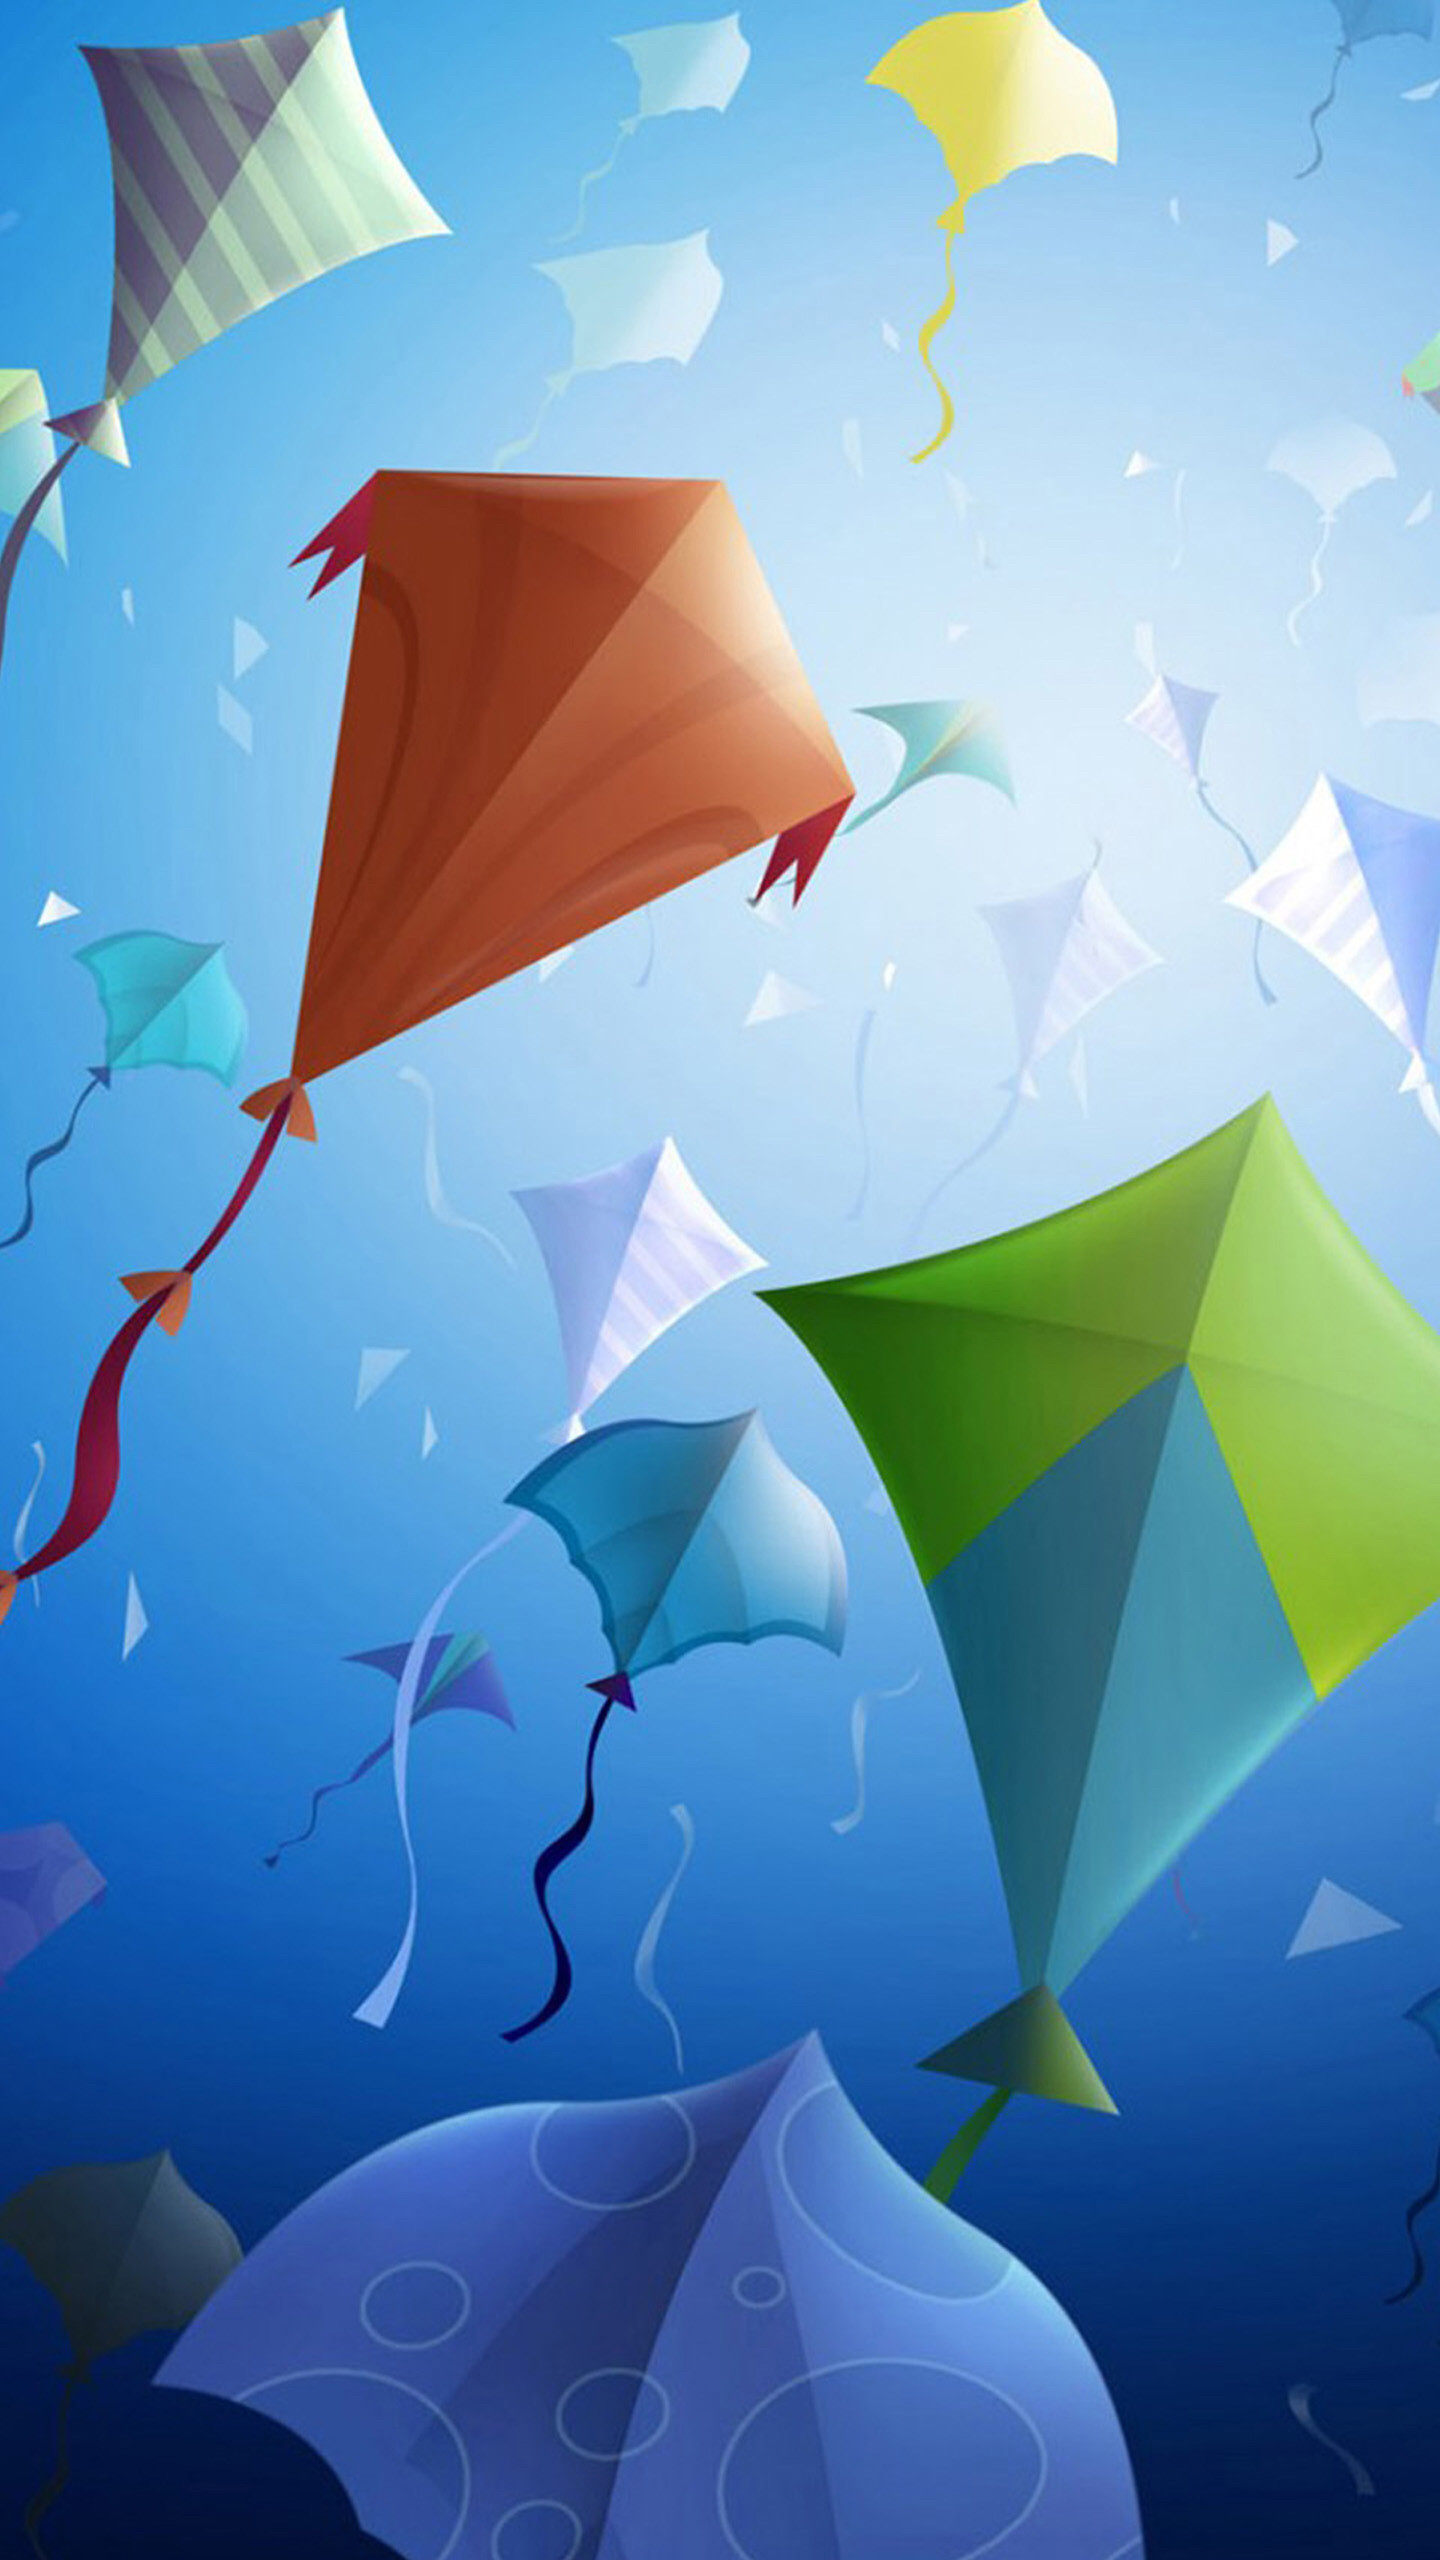 Blue, green, kites, light, abstract, apple, wallpaper, iPhone,